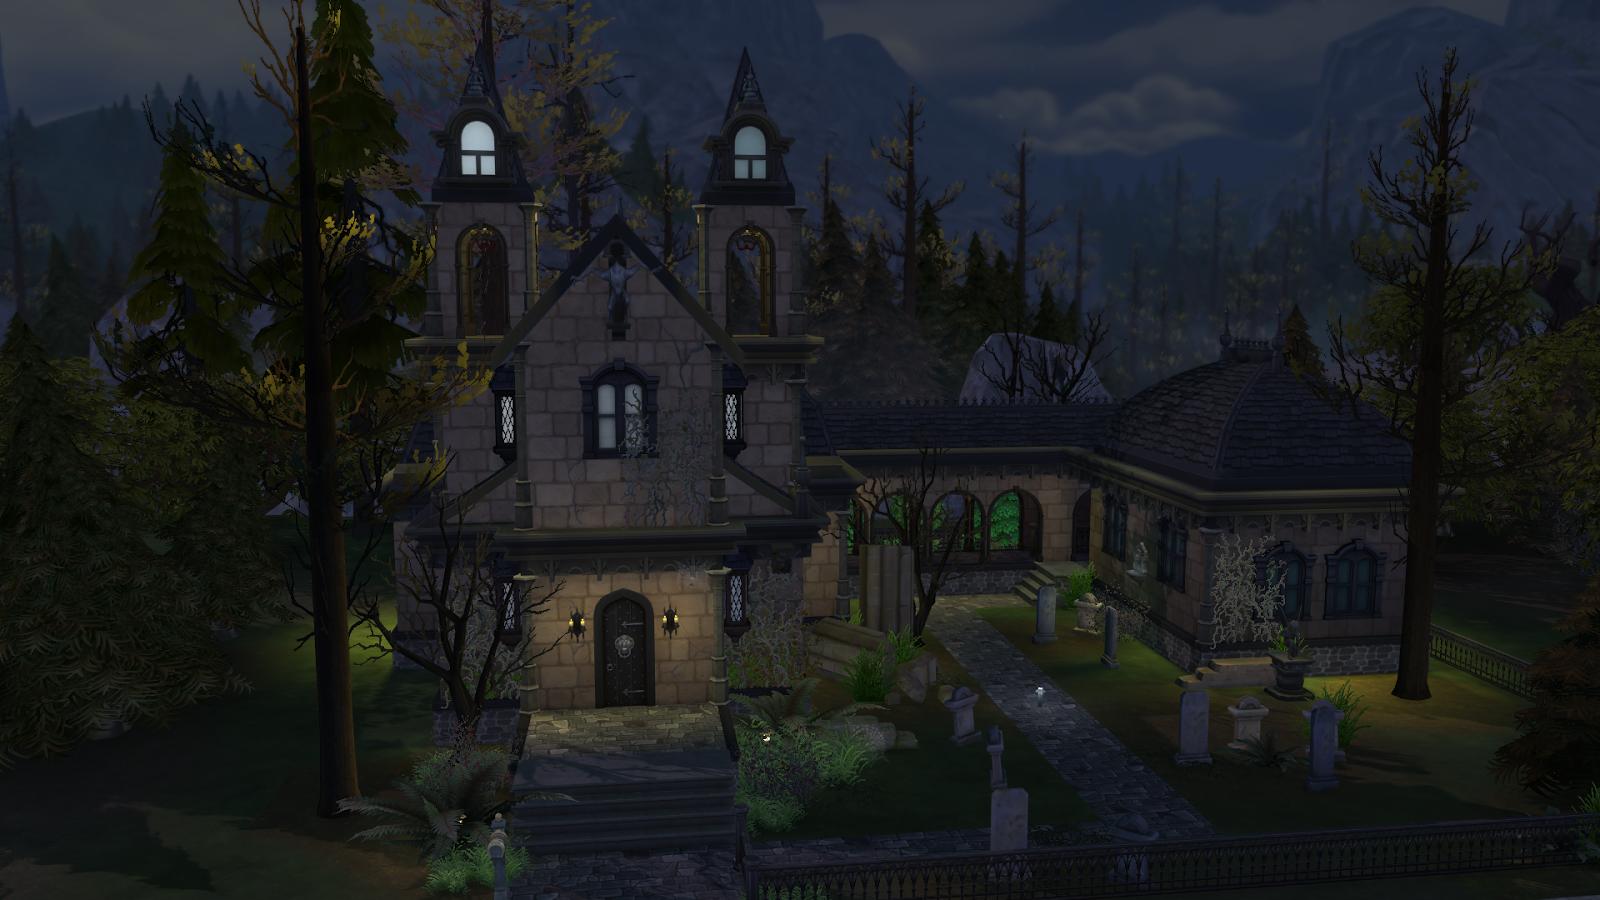 Ravenscroft: A Gothic Vampire Lair